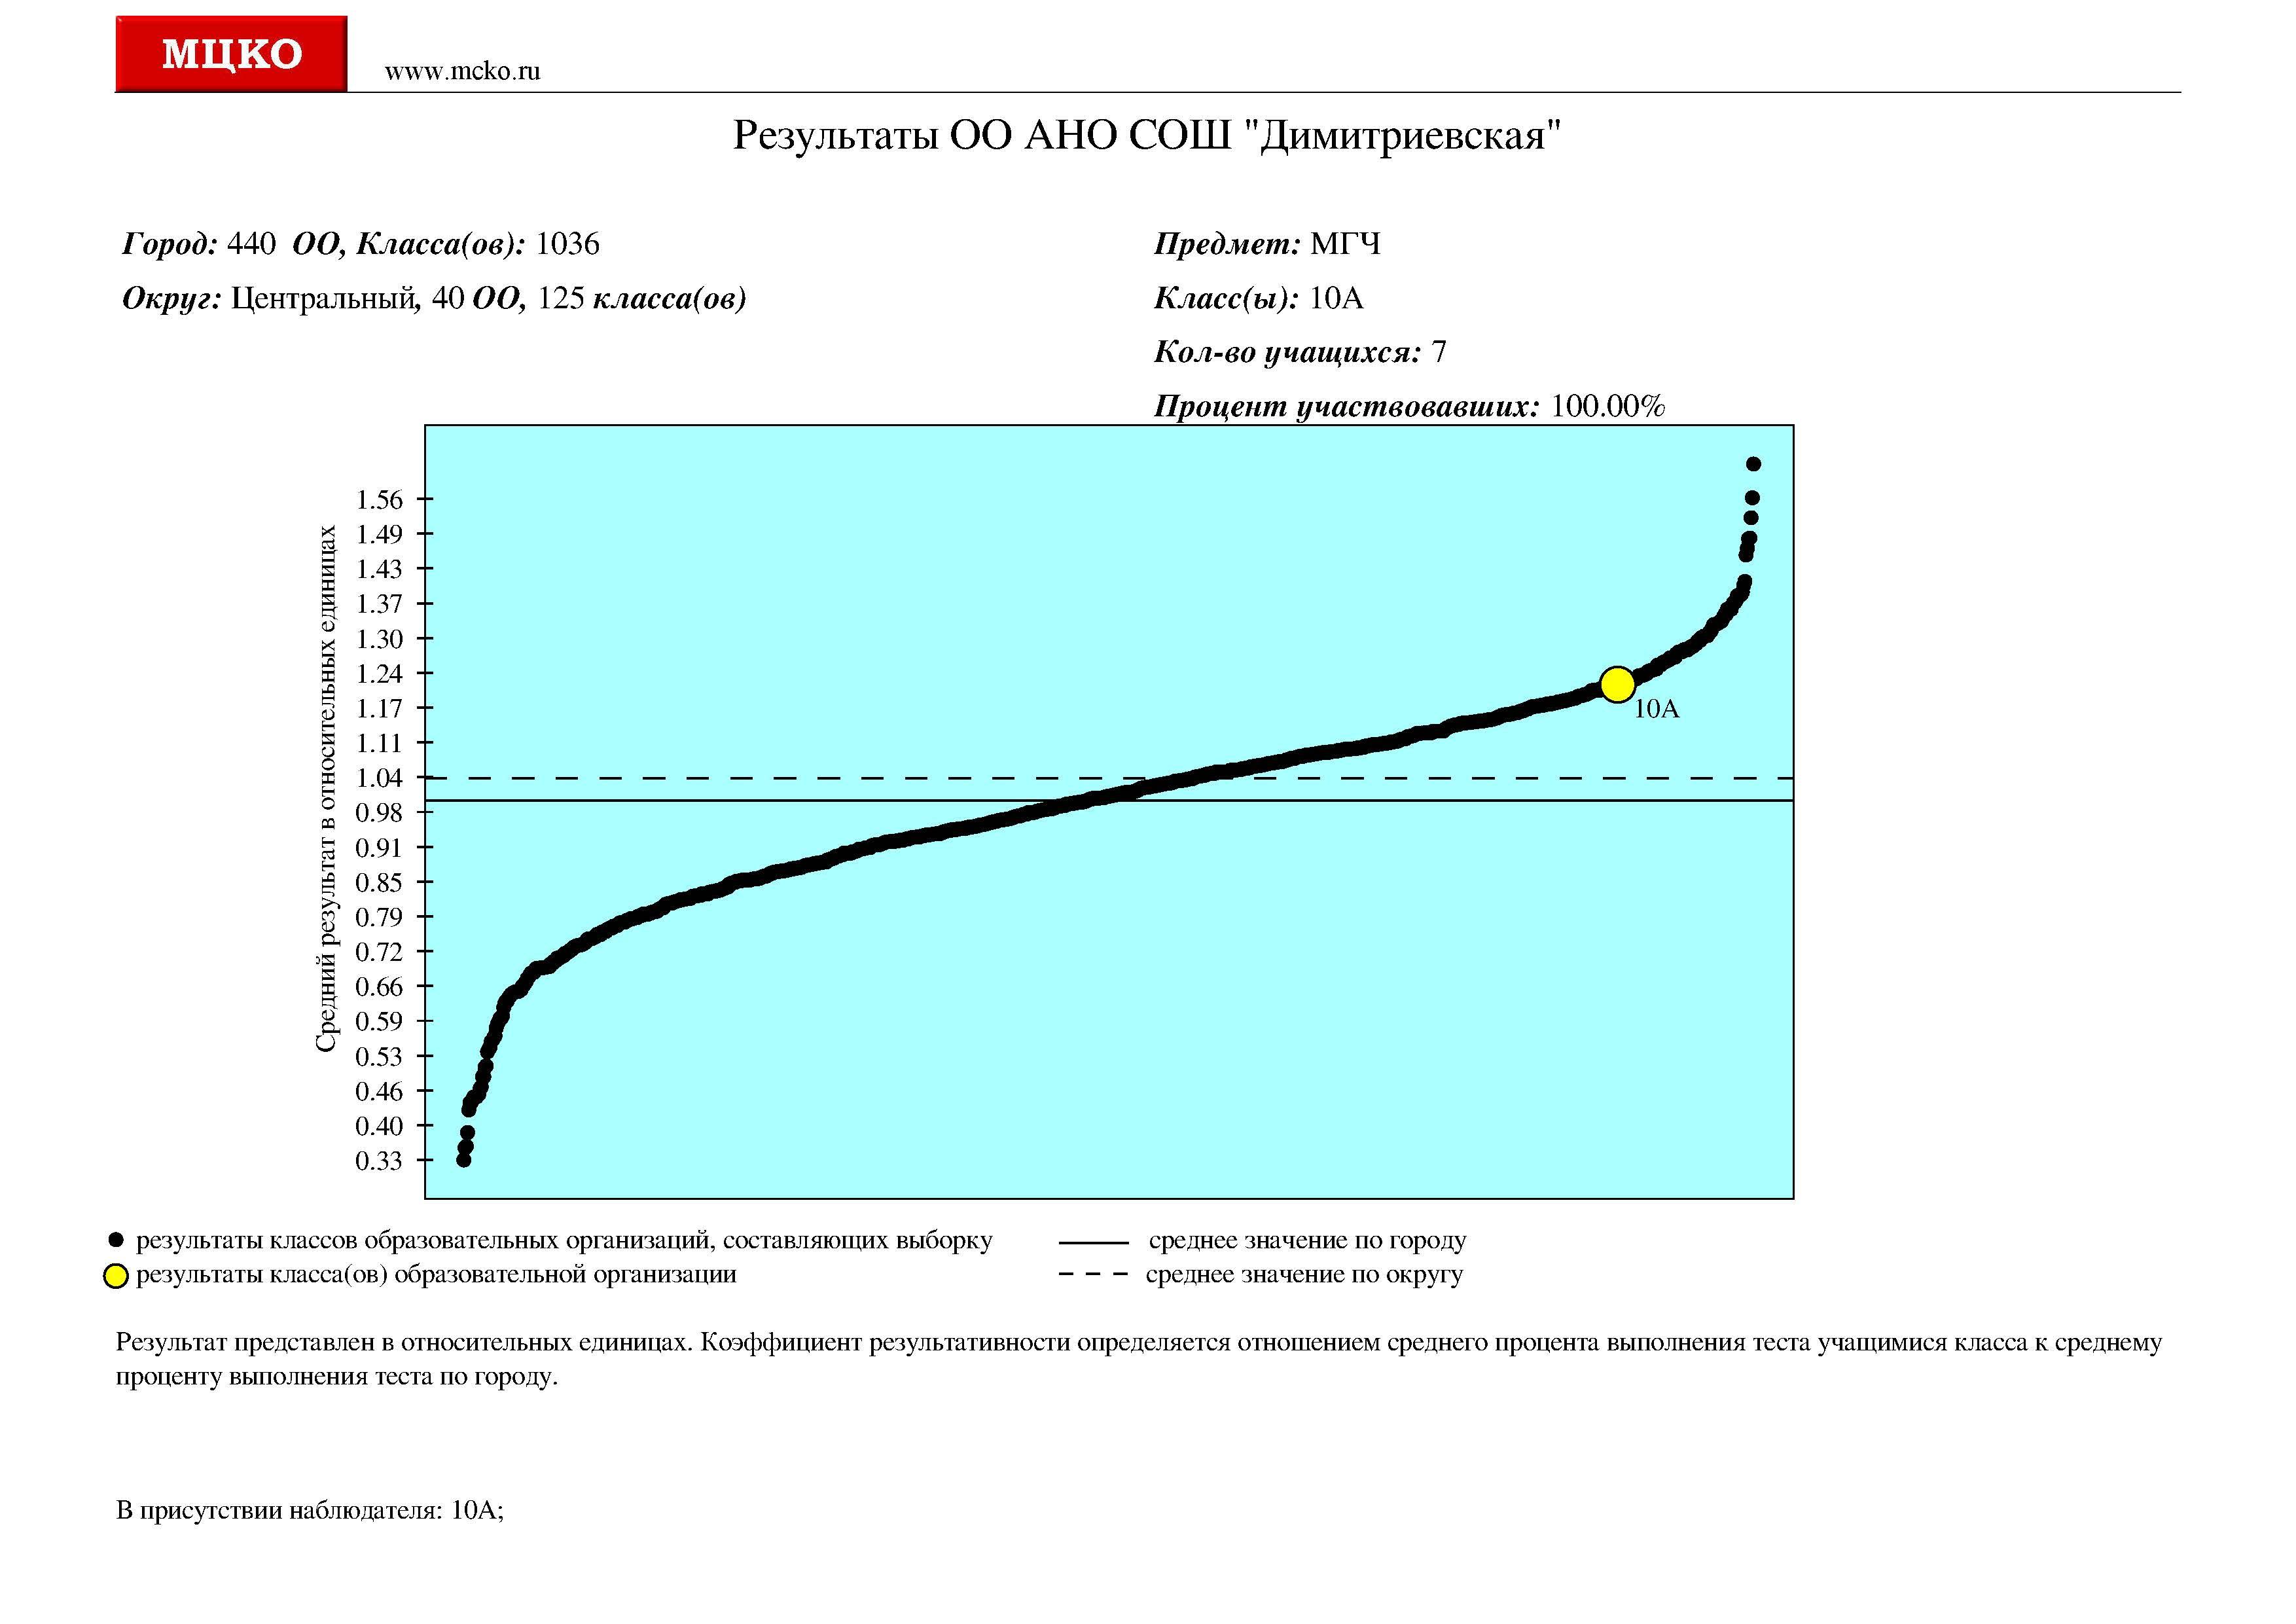 МЦКО 10 класс результат graph_9041 (18)